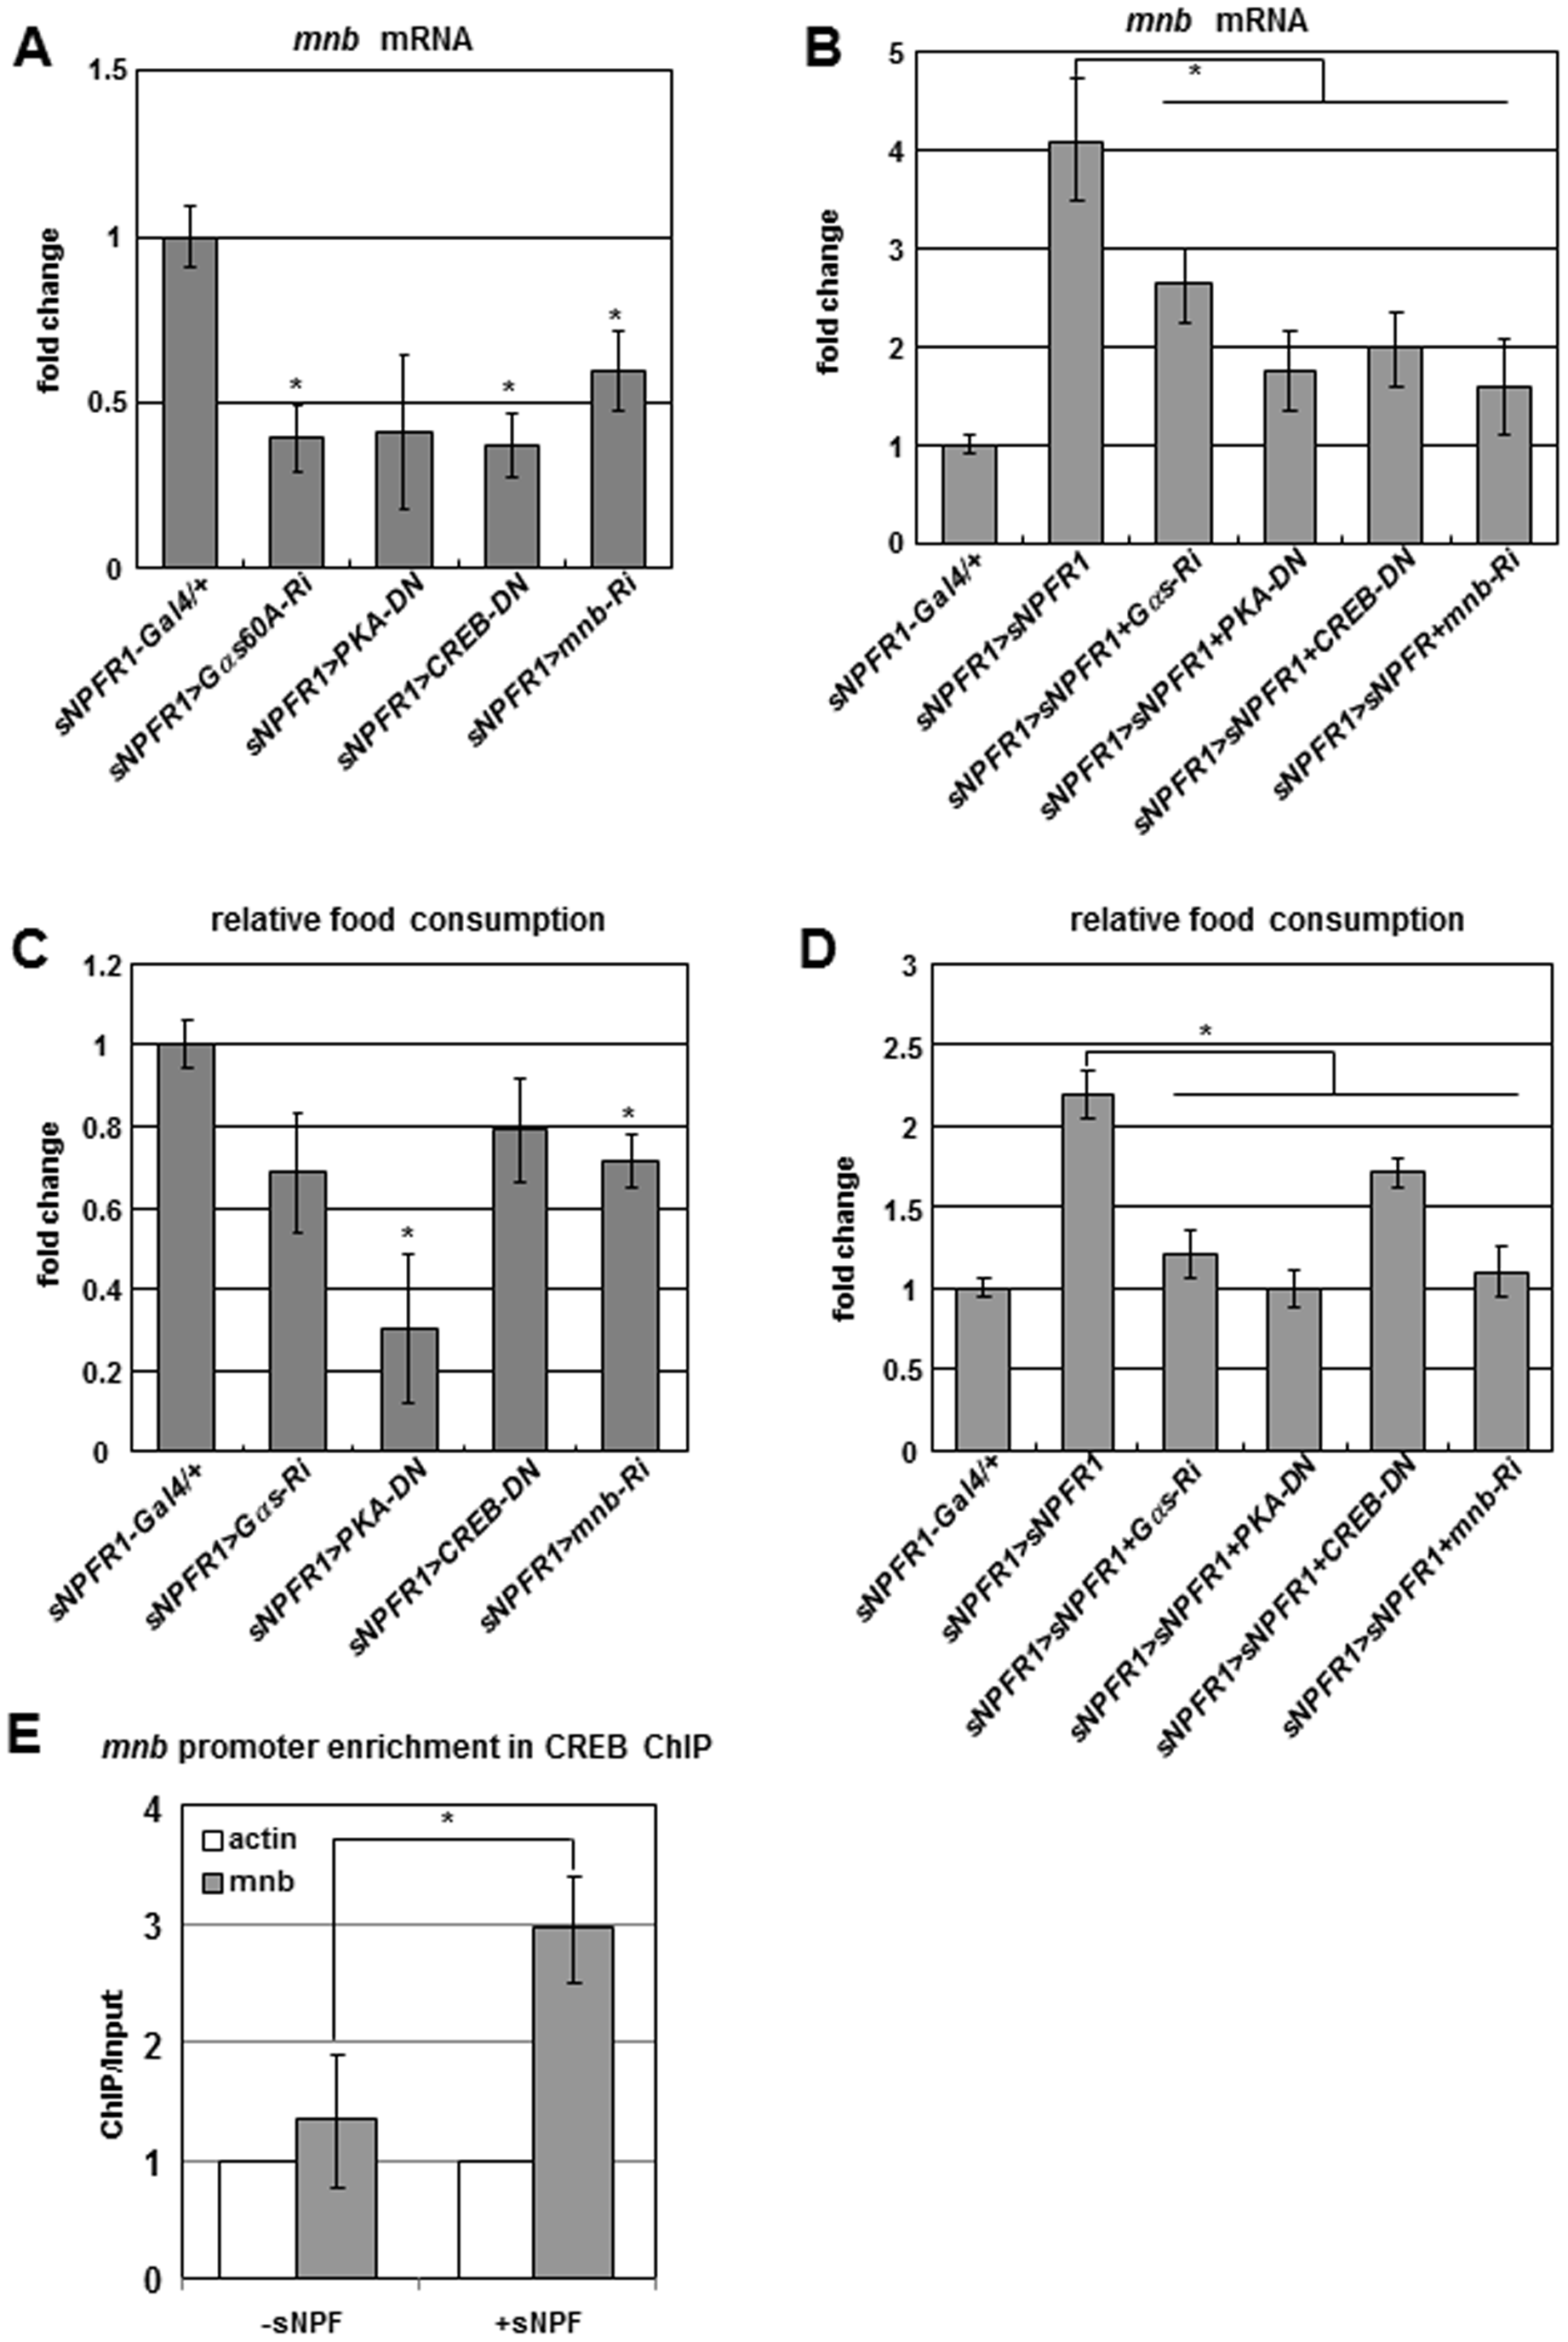 Genetic interactions among <i>sNPFR1</i>, <i>Gαs</i>, <i>PKA</i>, <i>CREB</i>, and <i>mnb</i> genes and CREB ChIP–PCR analysis.